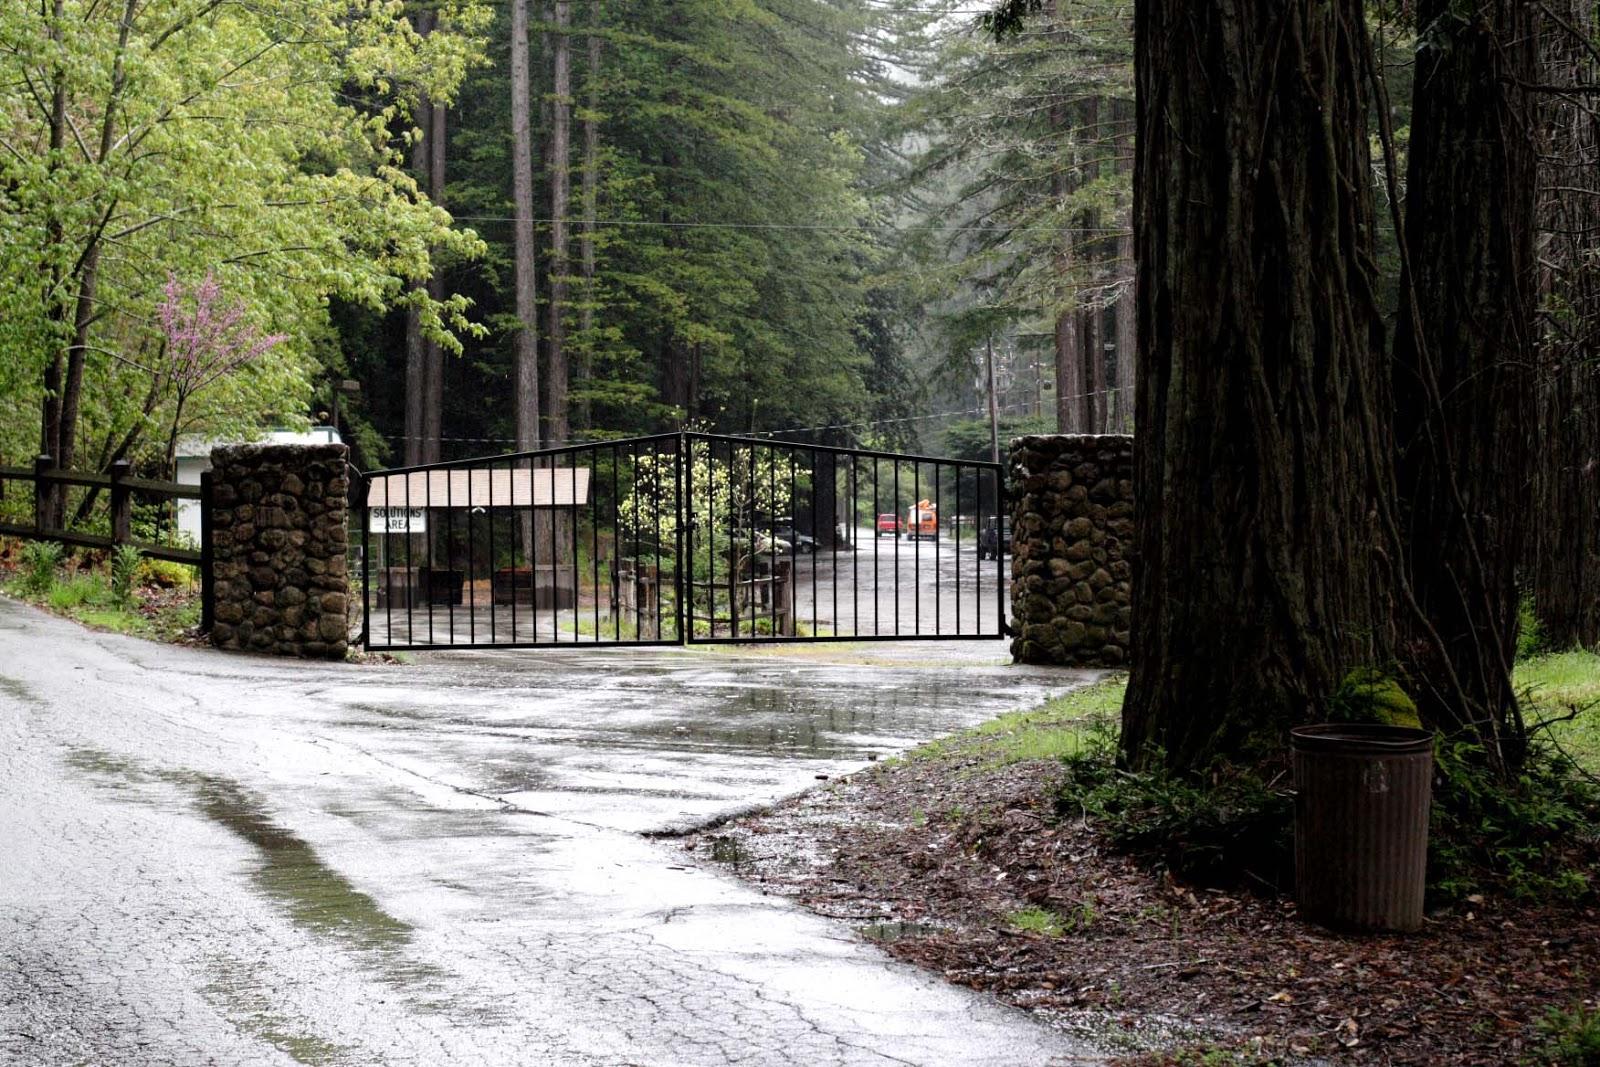 Bohemian Grove Gate